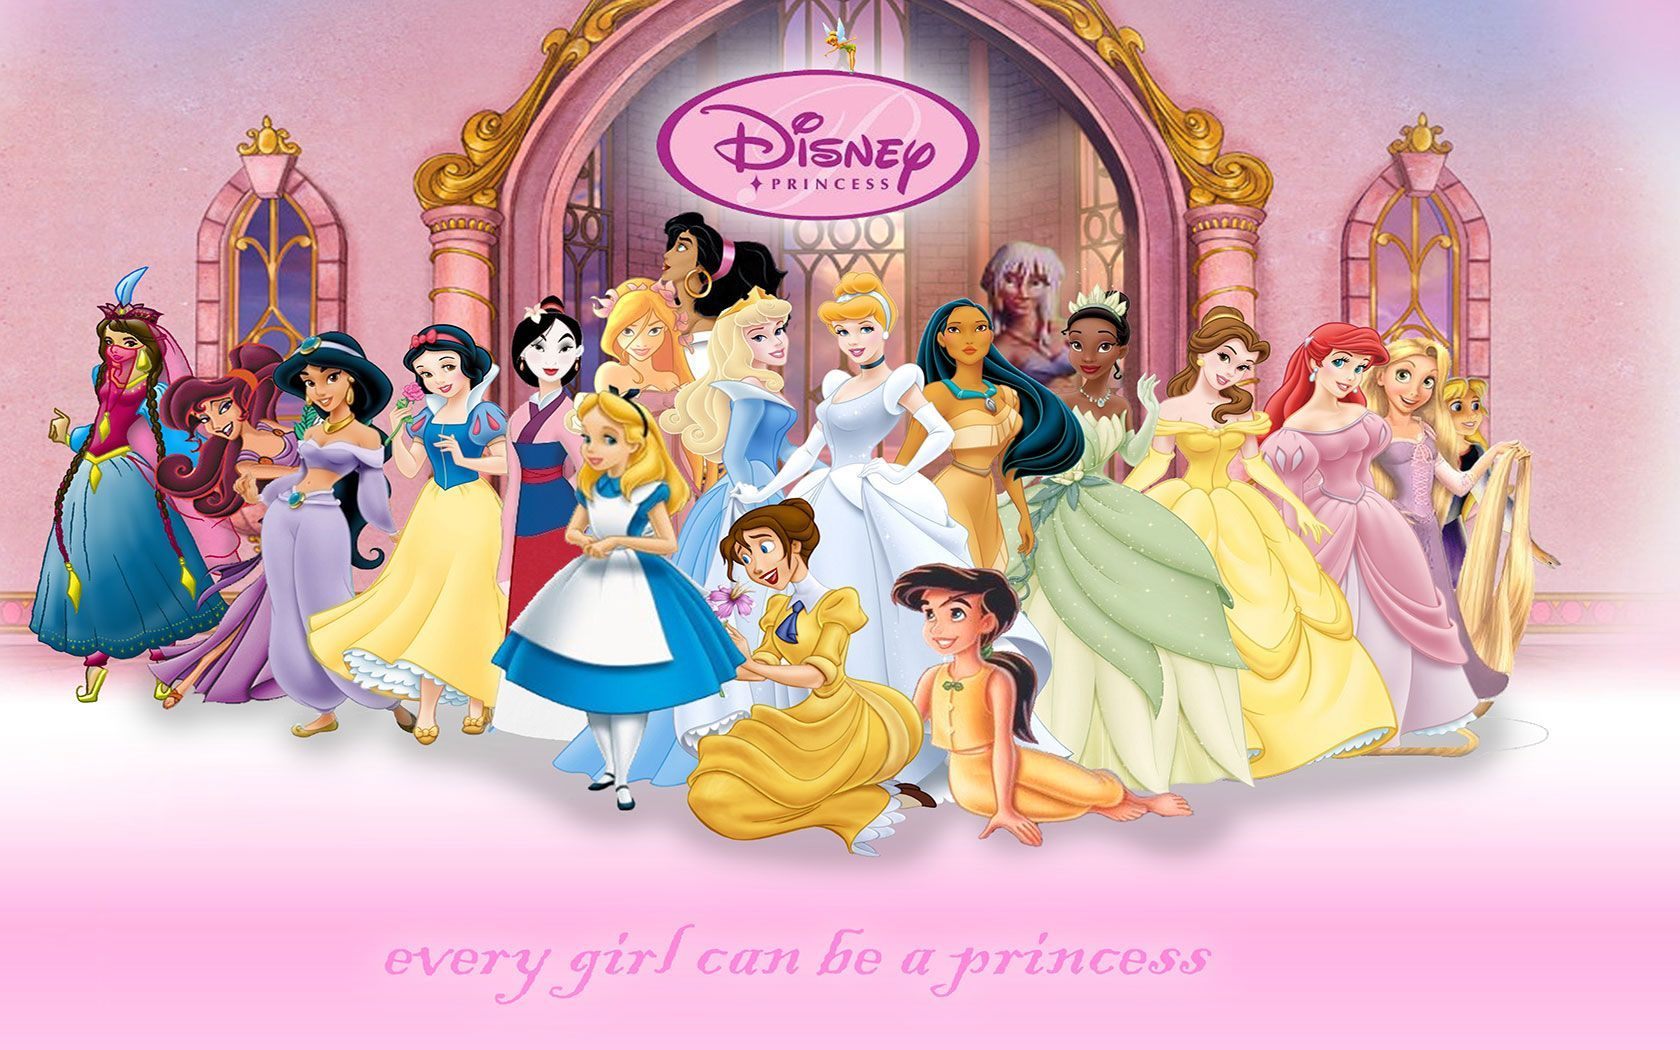 Disney Princess Wallpapers Top Free Disney Princess